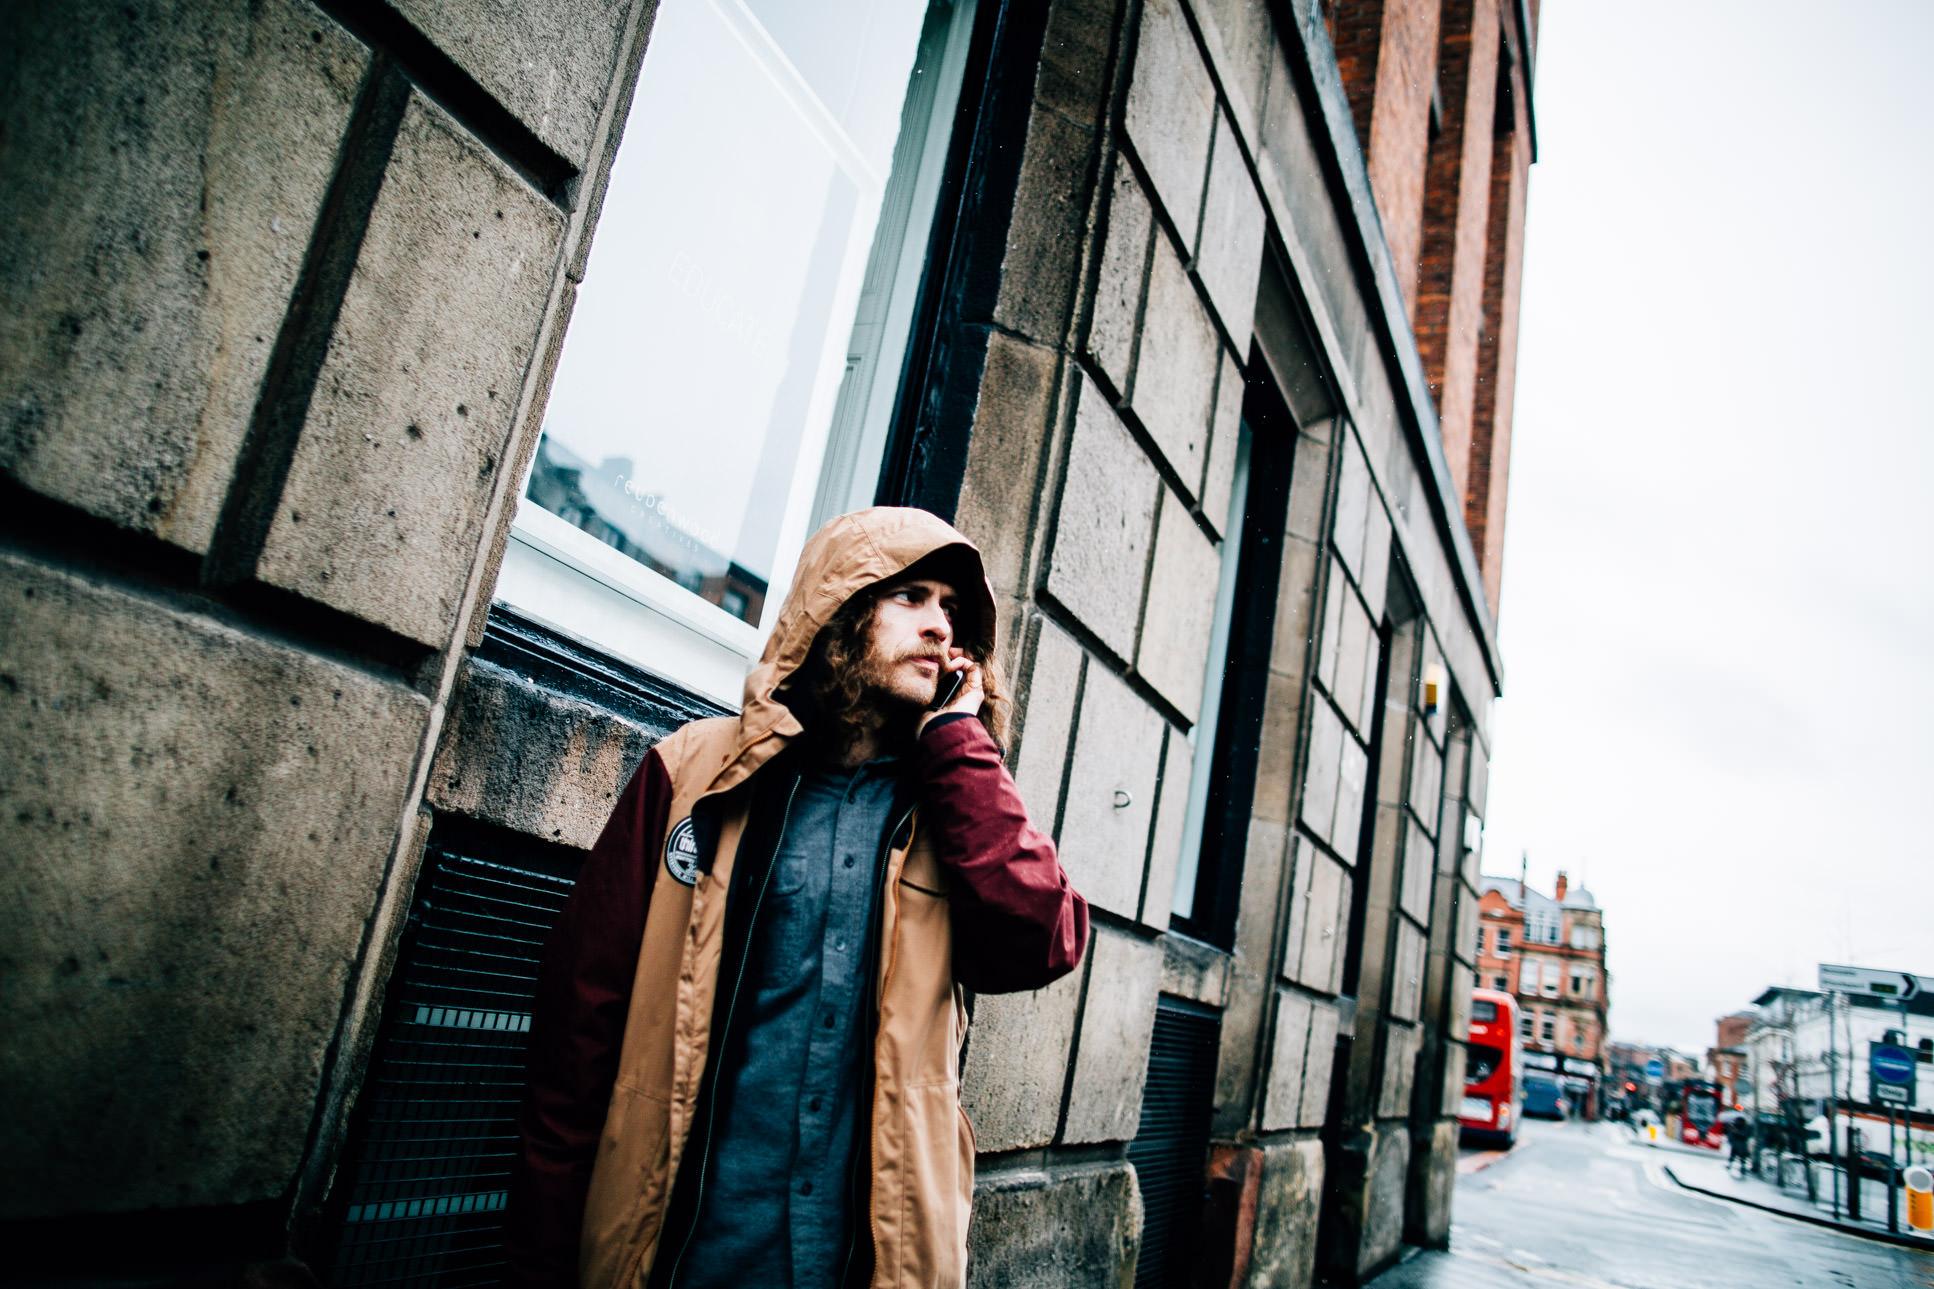 Street Photography18